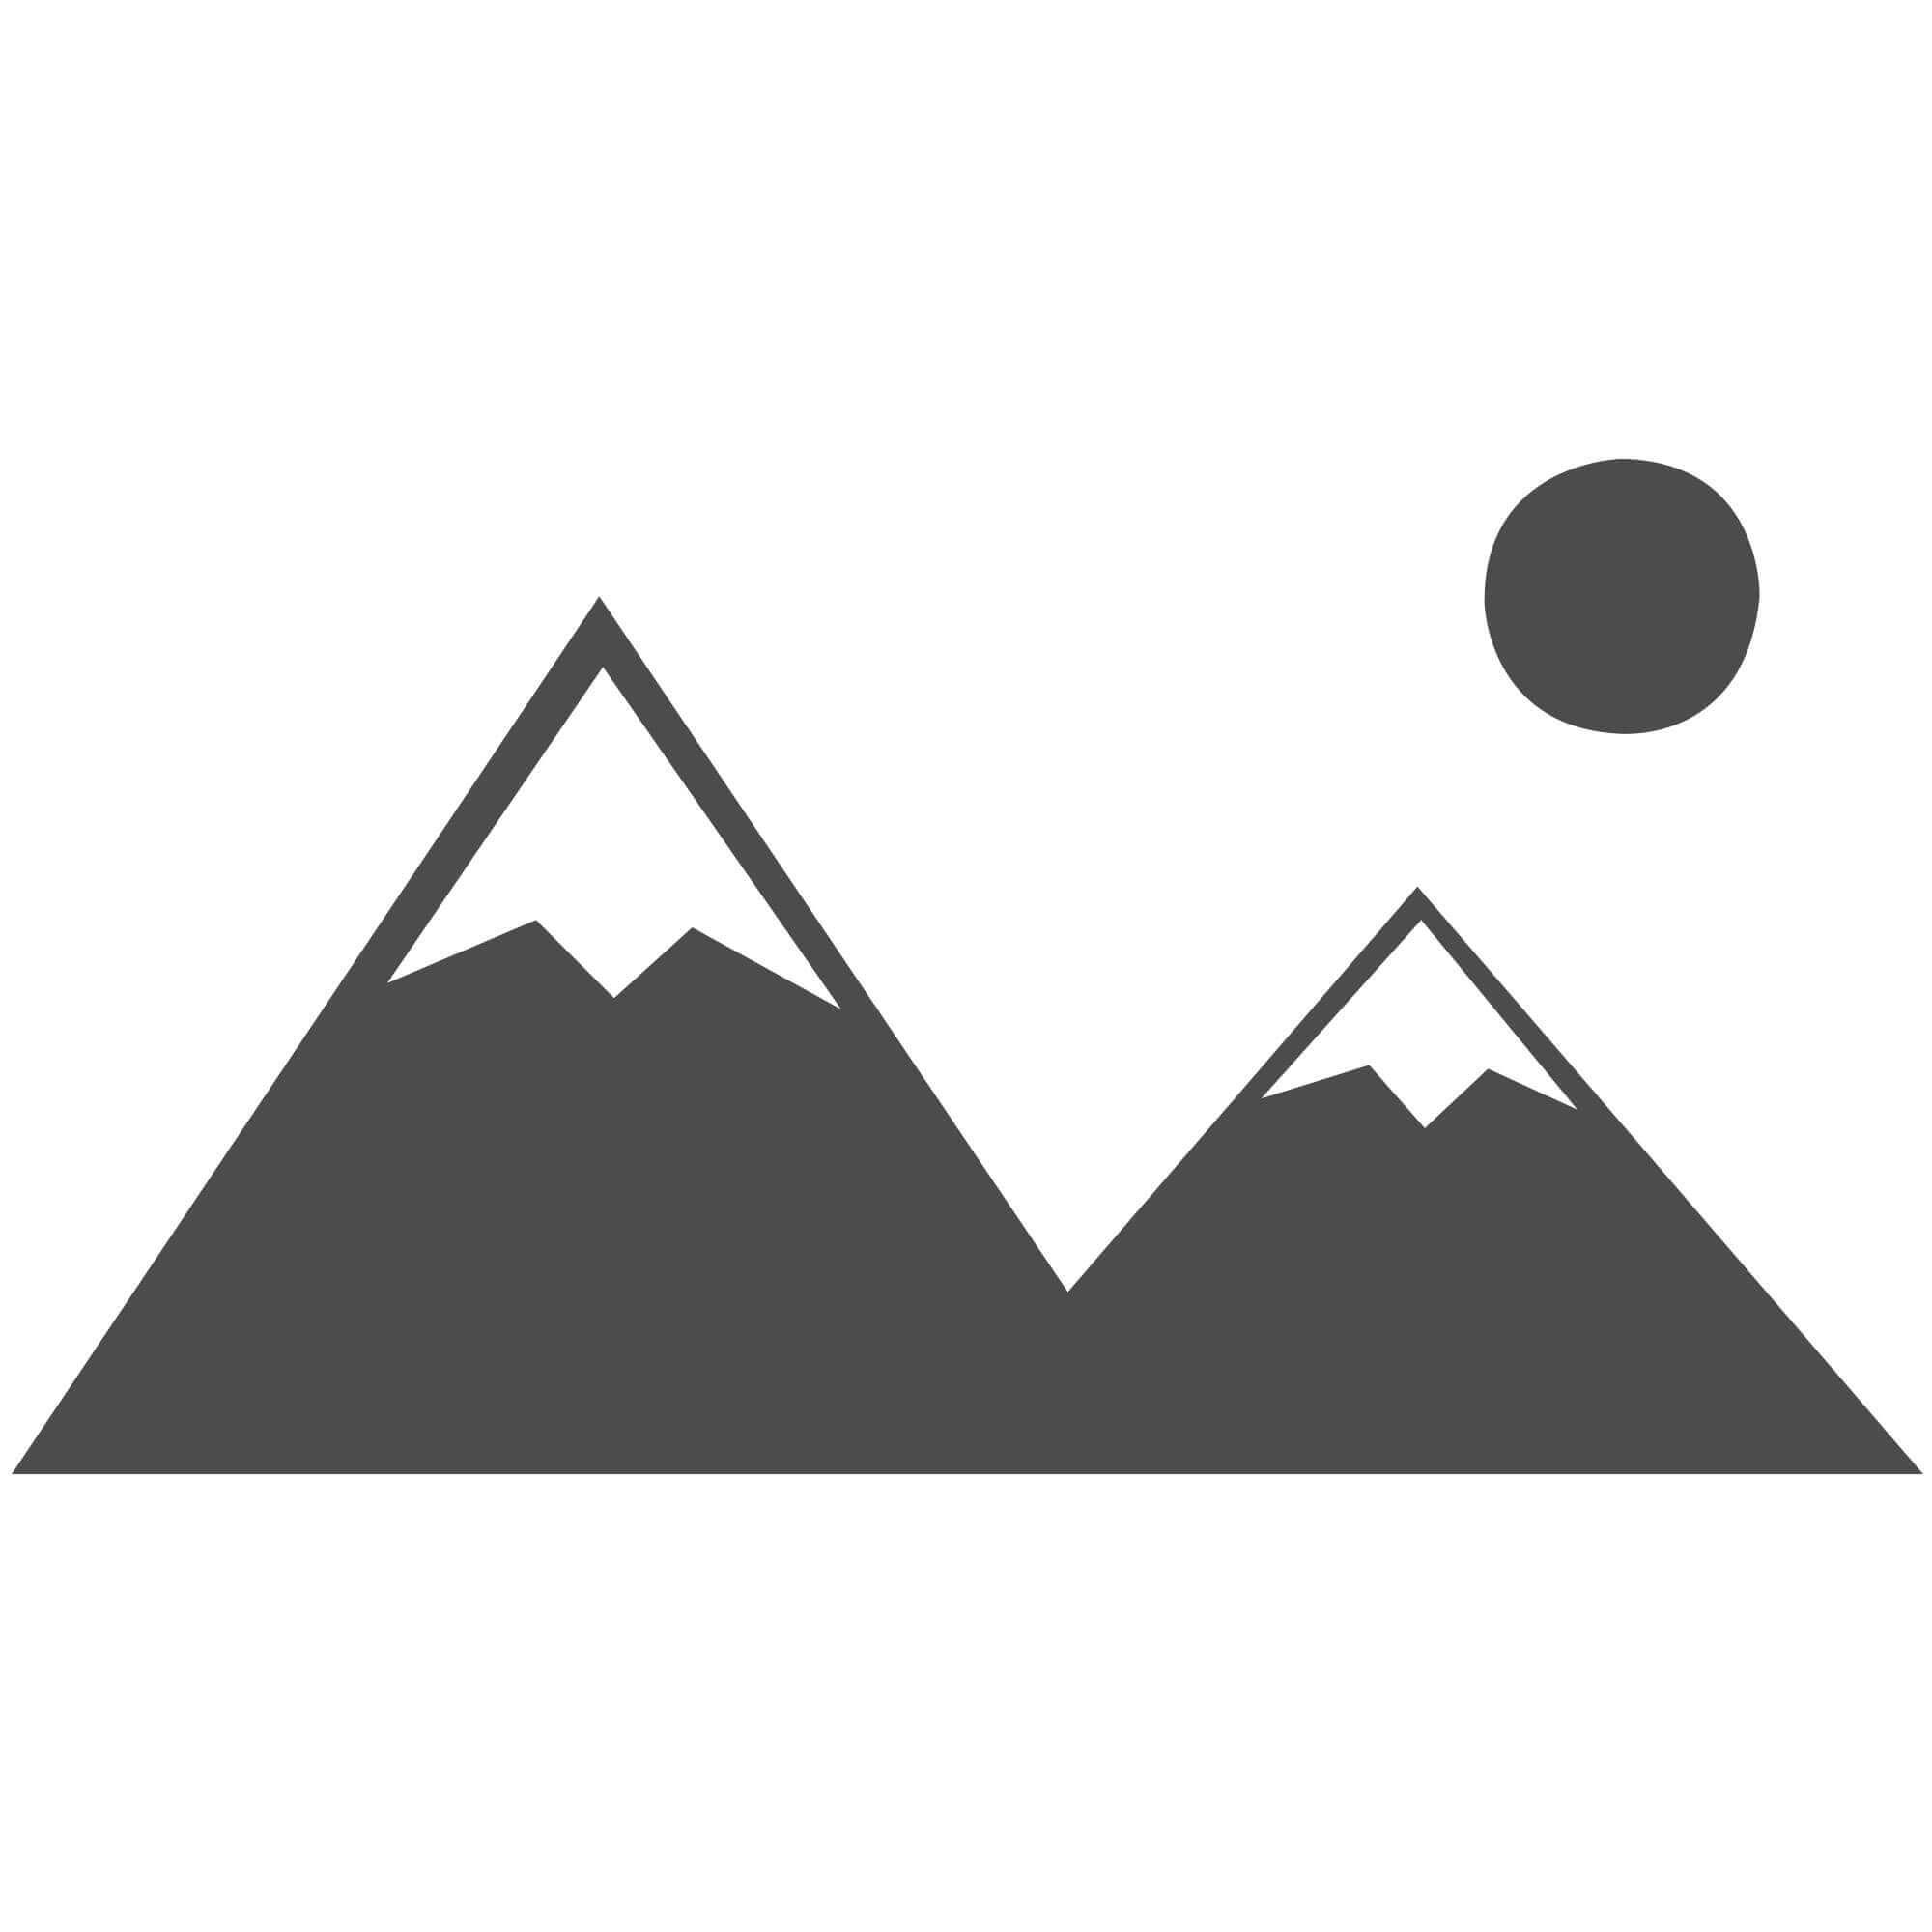 "Verge Lattice Grey Silver Rug - Size 120 x 170 cm (4' x 5'7"")"